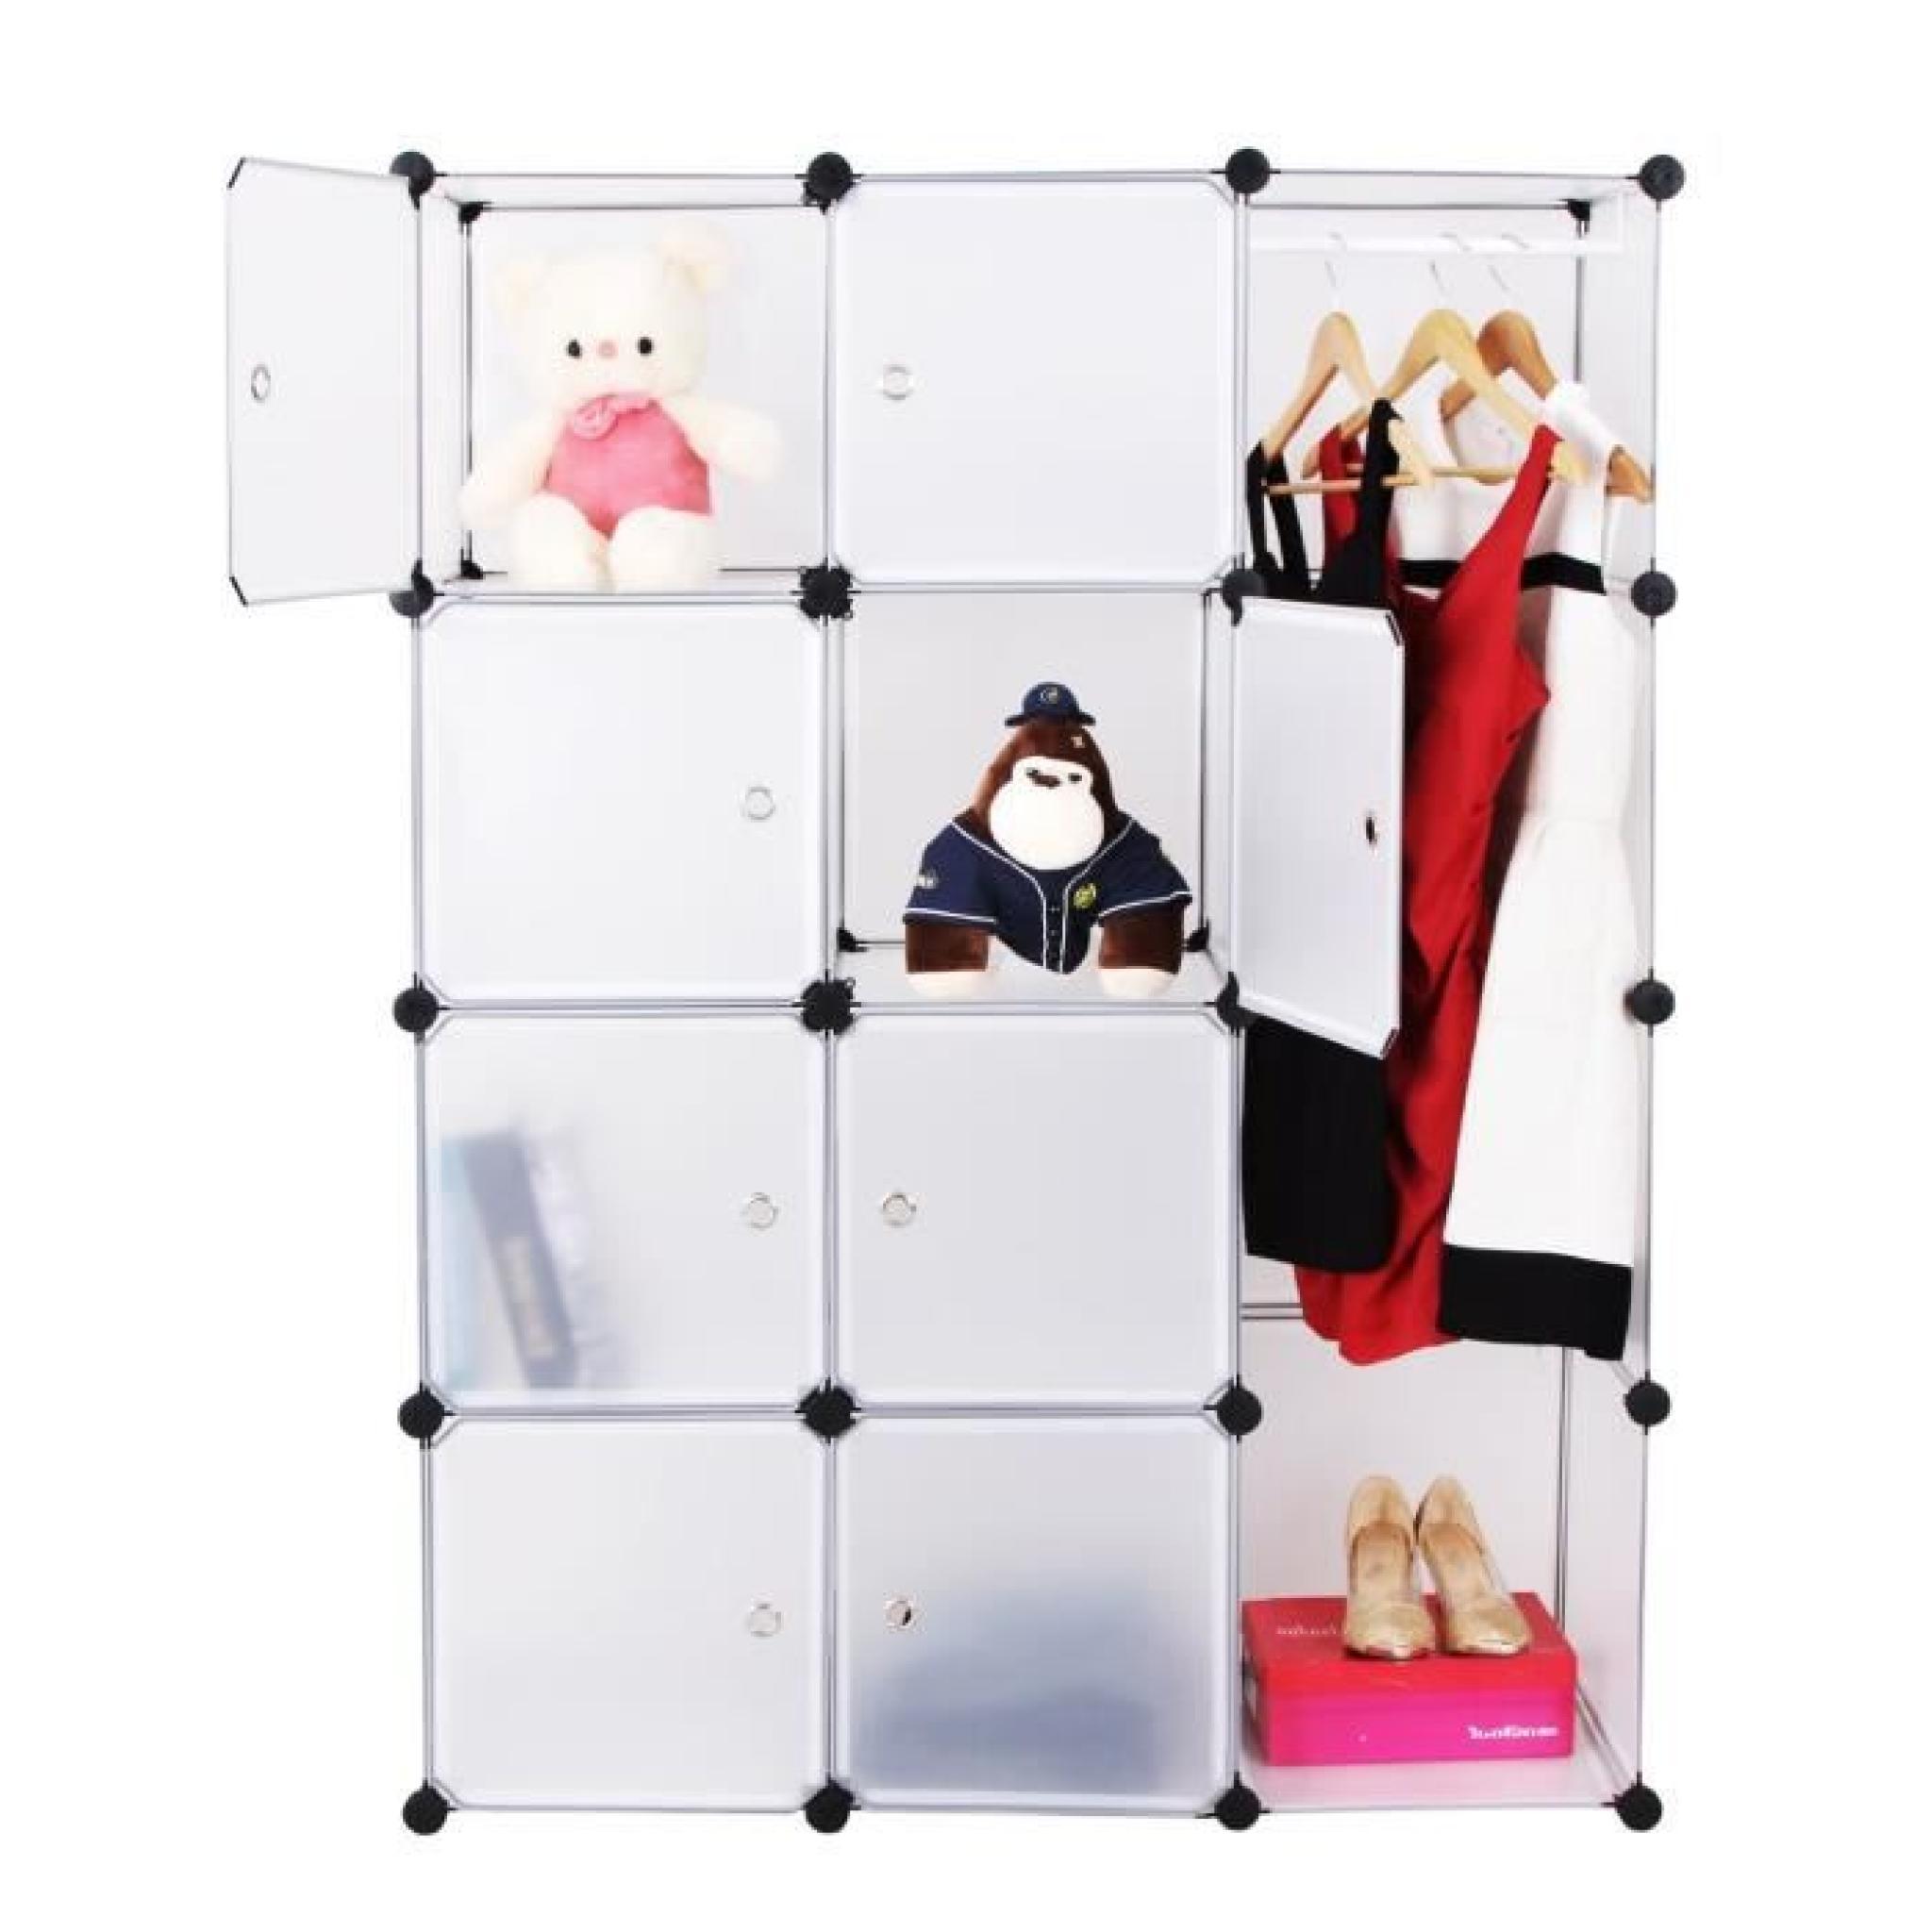 Penderie Modulable armoire,etagere,penderie,,modulable - achat/vente dressing pas cher